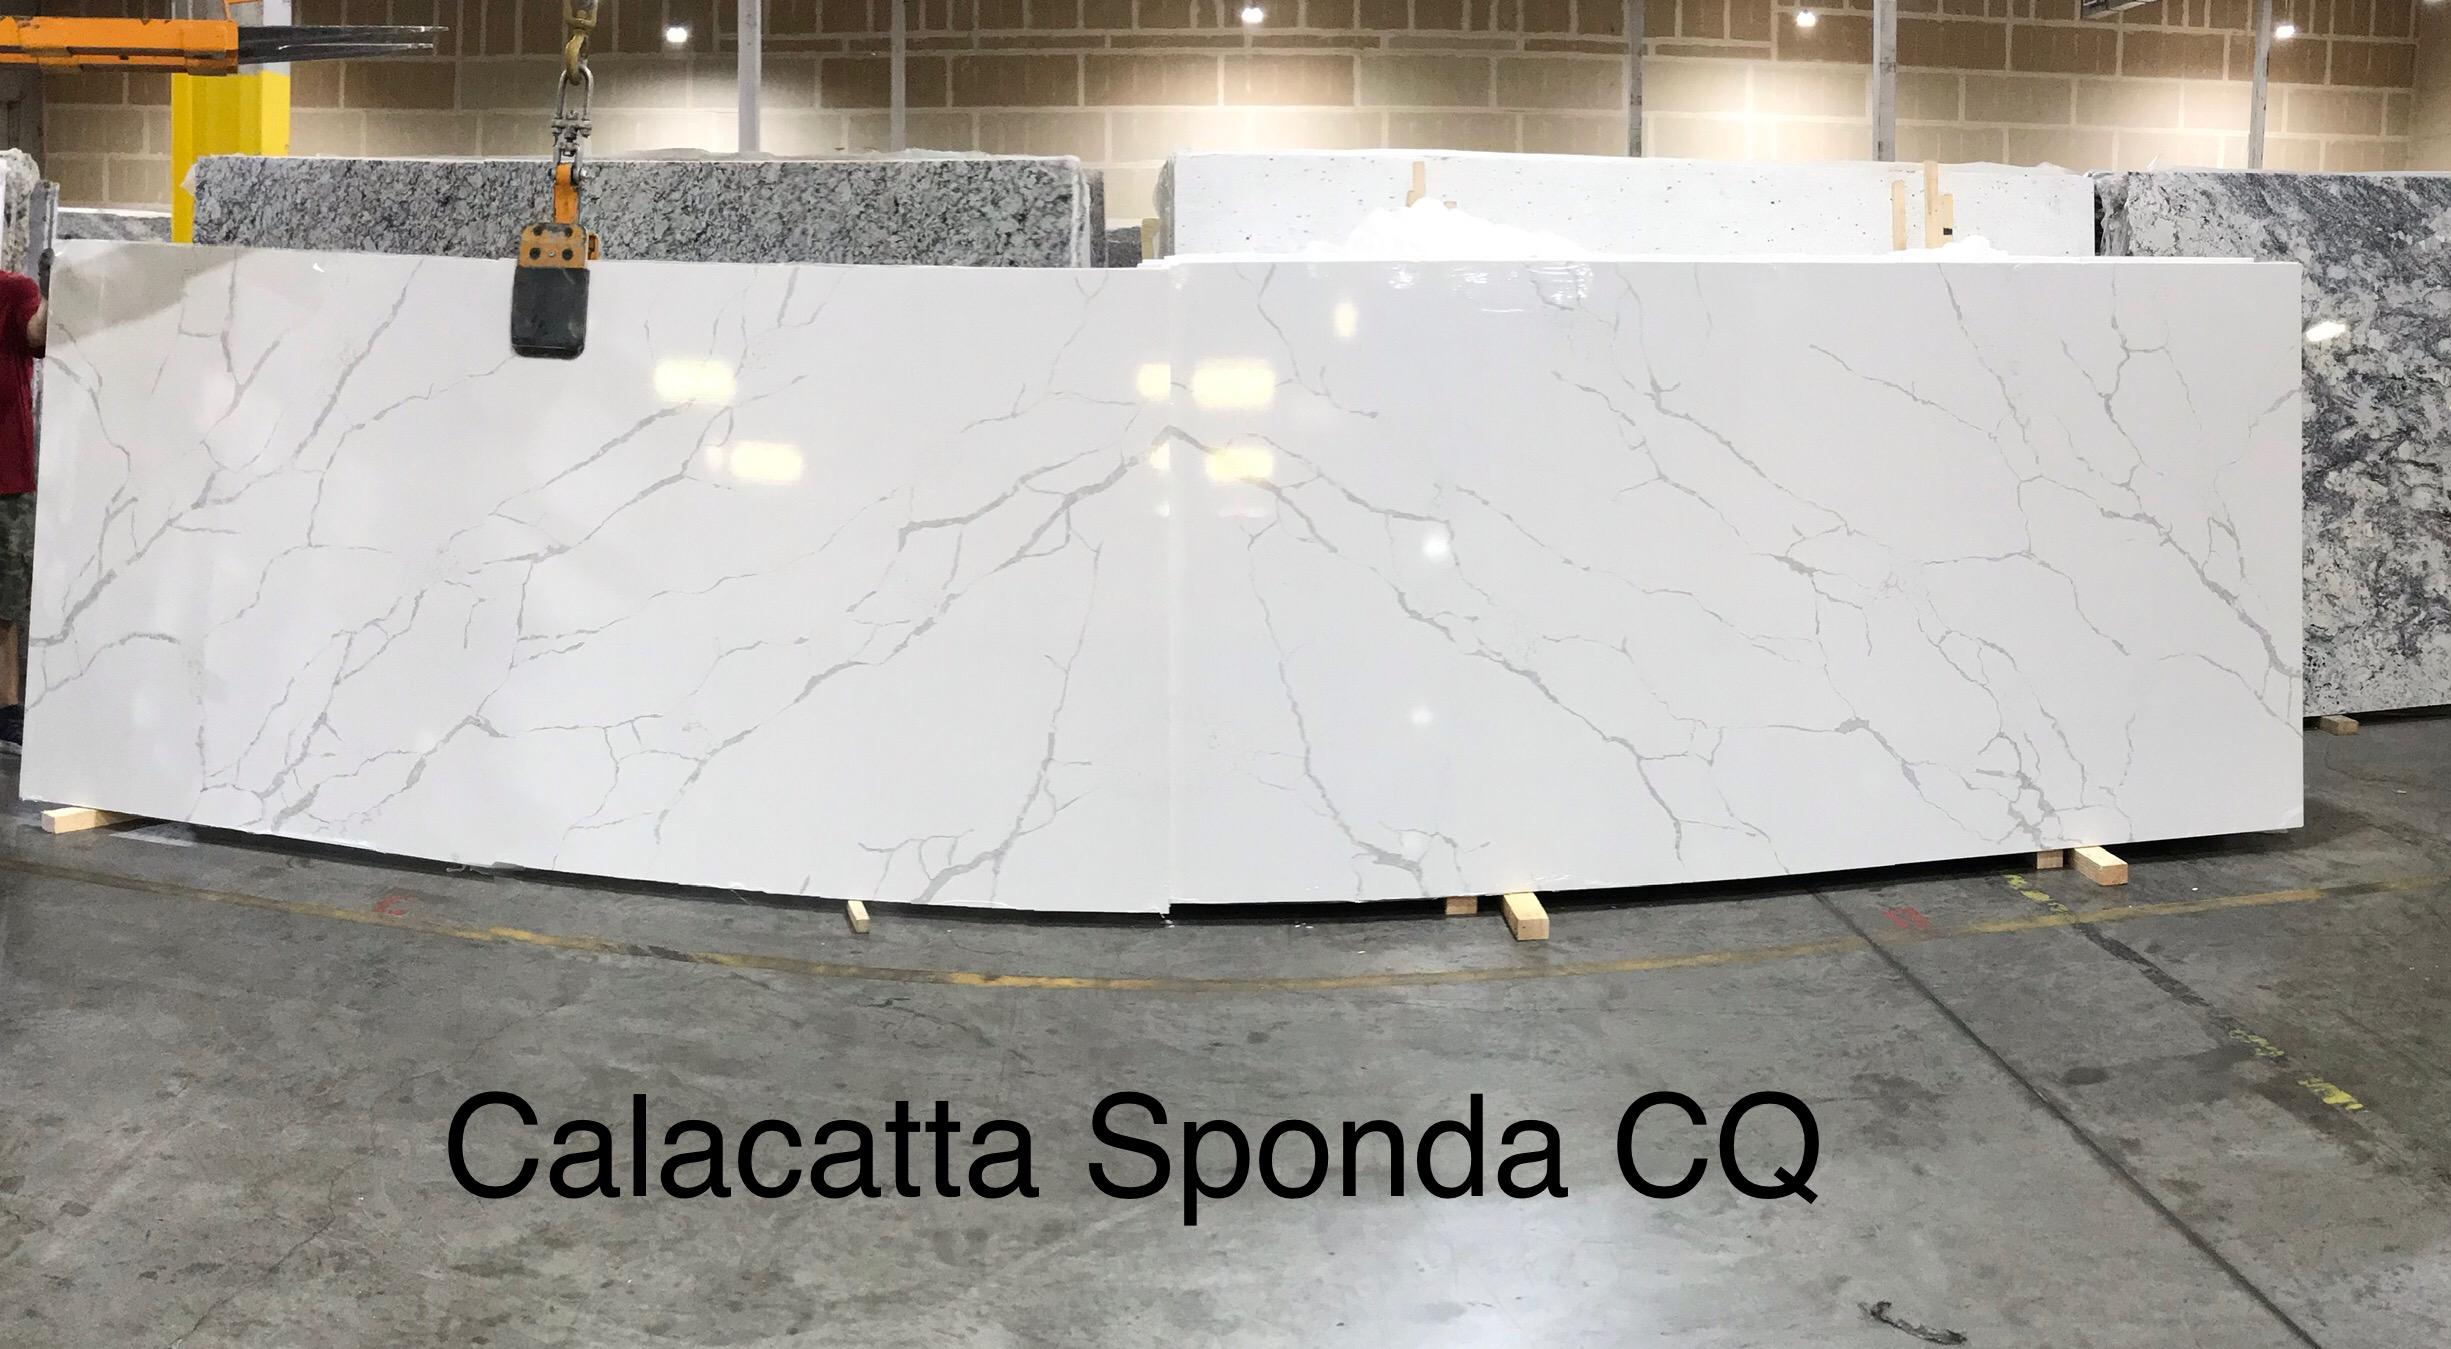 Calacatta Sponda Extra CQ - Dallas, TX